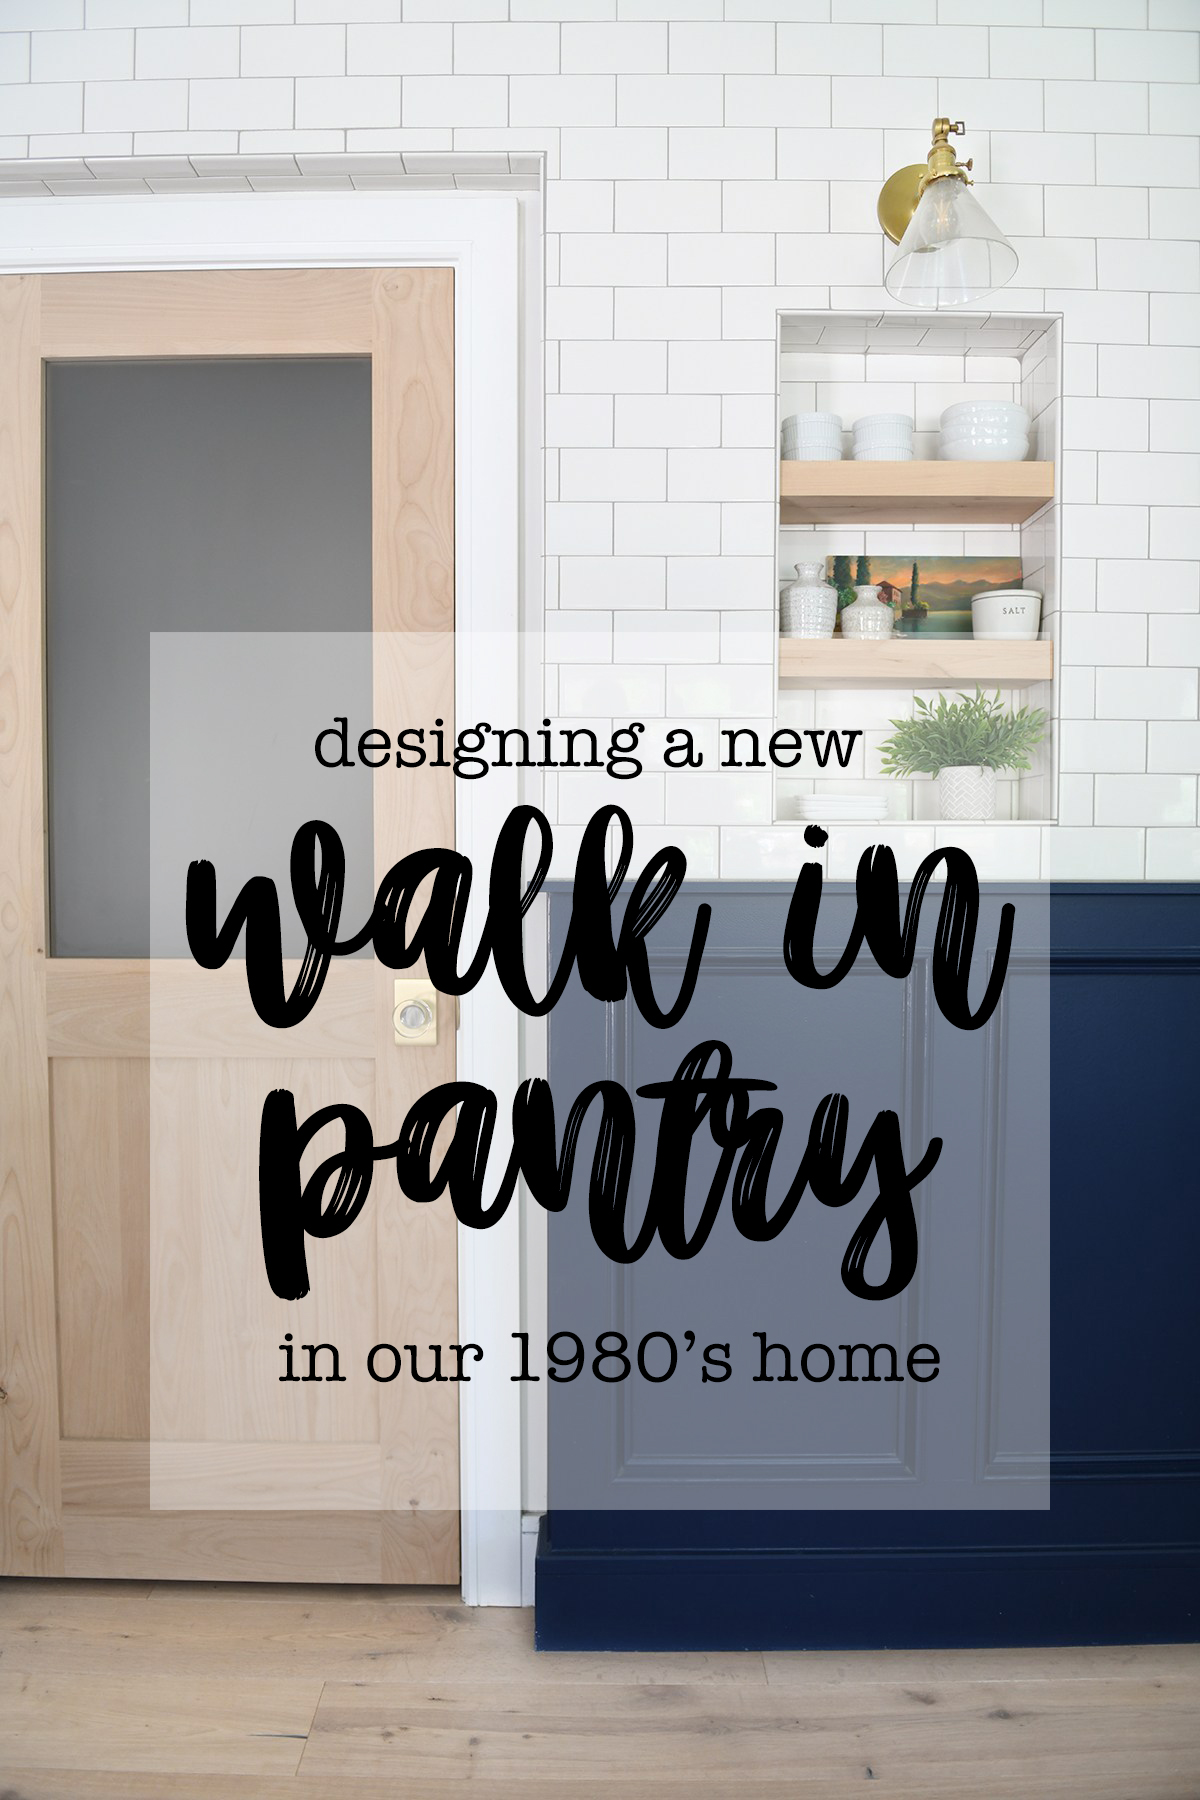 New walk in pantry